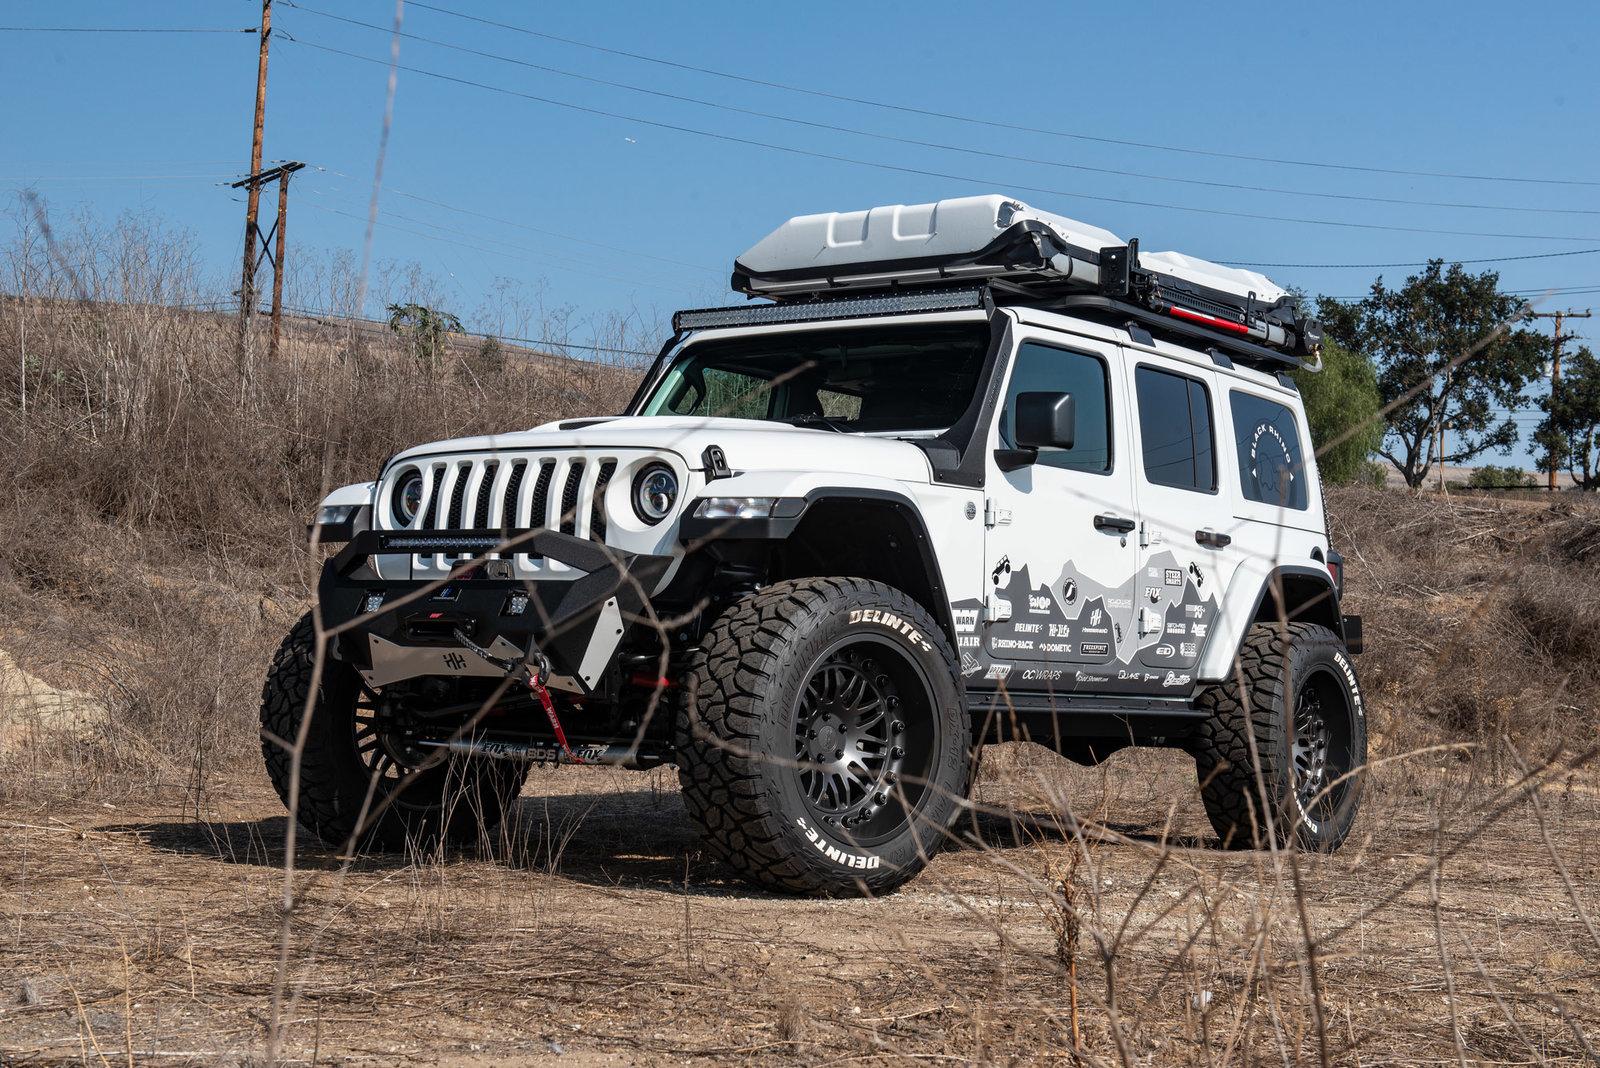 Jeep Jl Overland Build